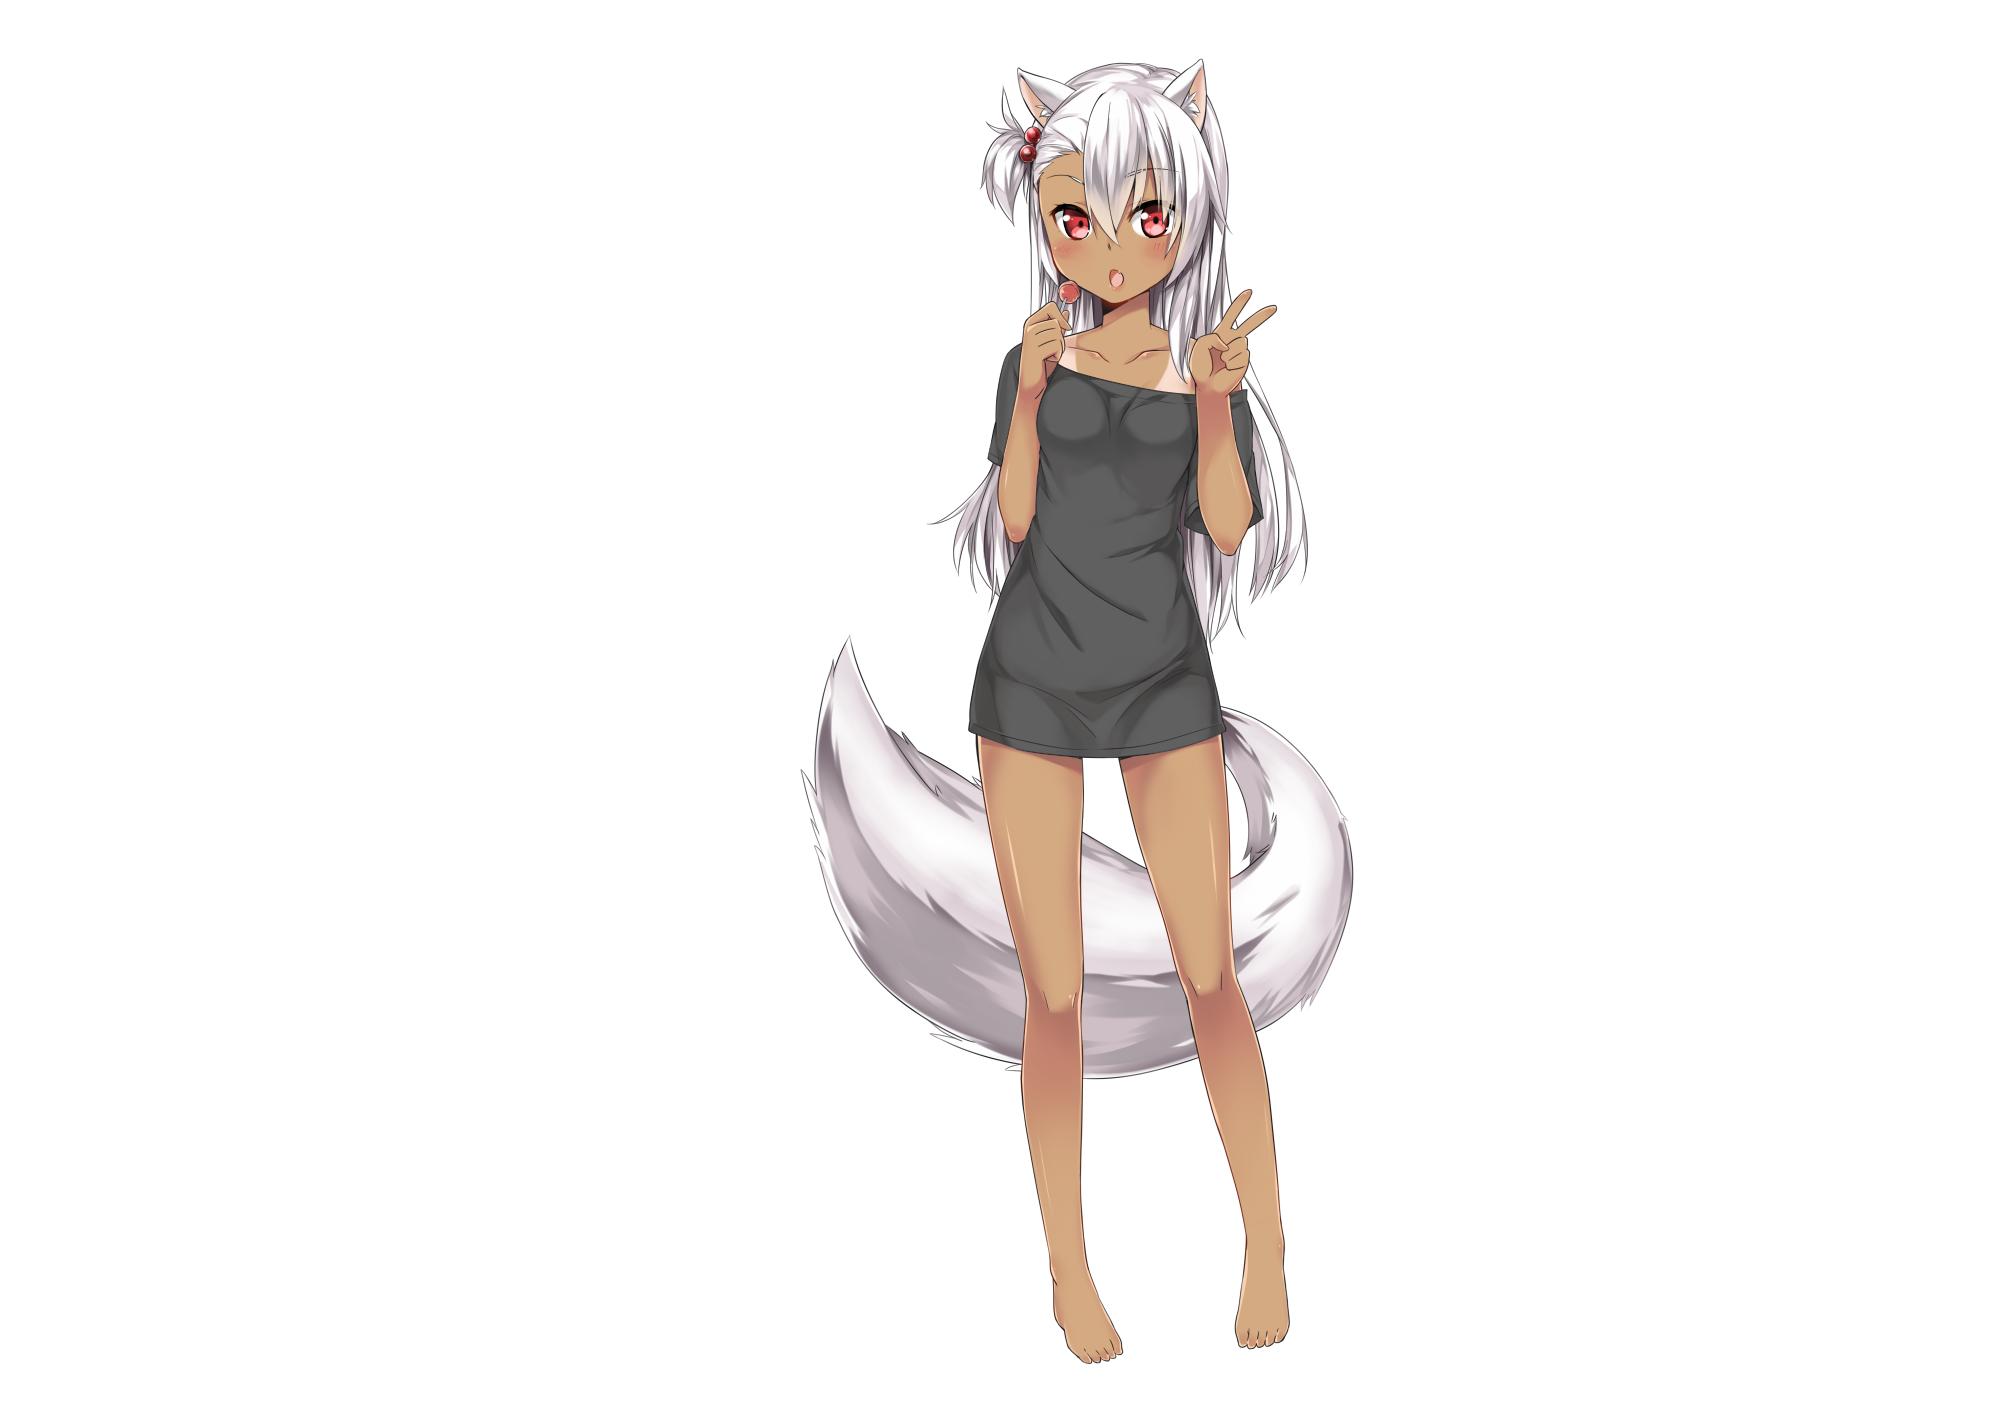 Anime 2000x1412 anime girls animal ears tail long hair red eyes silver hair dark skin tan lines original characters